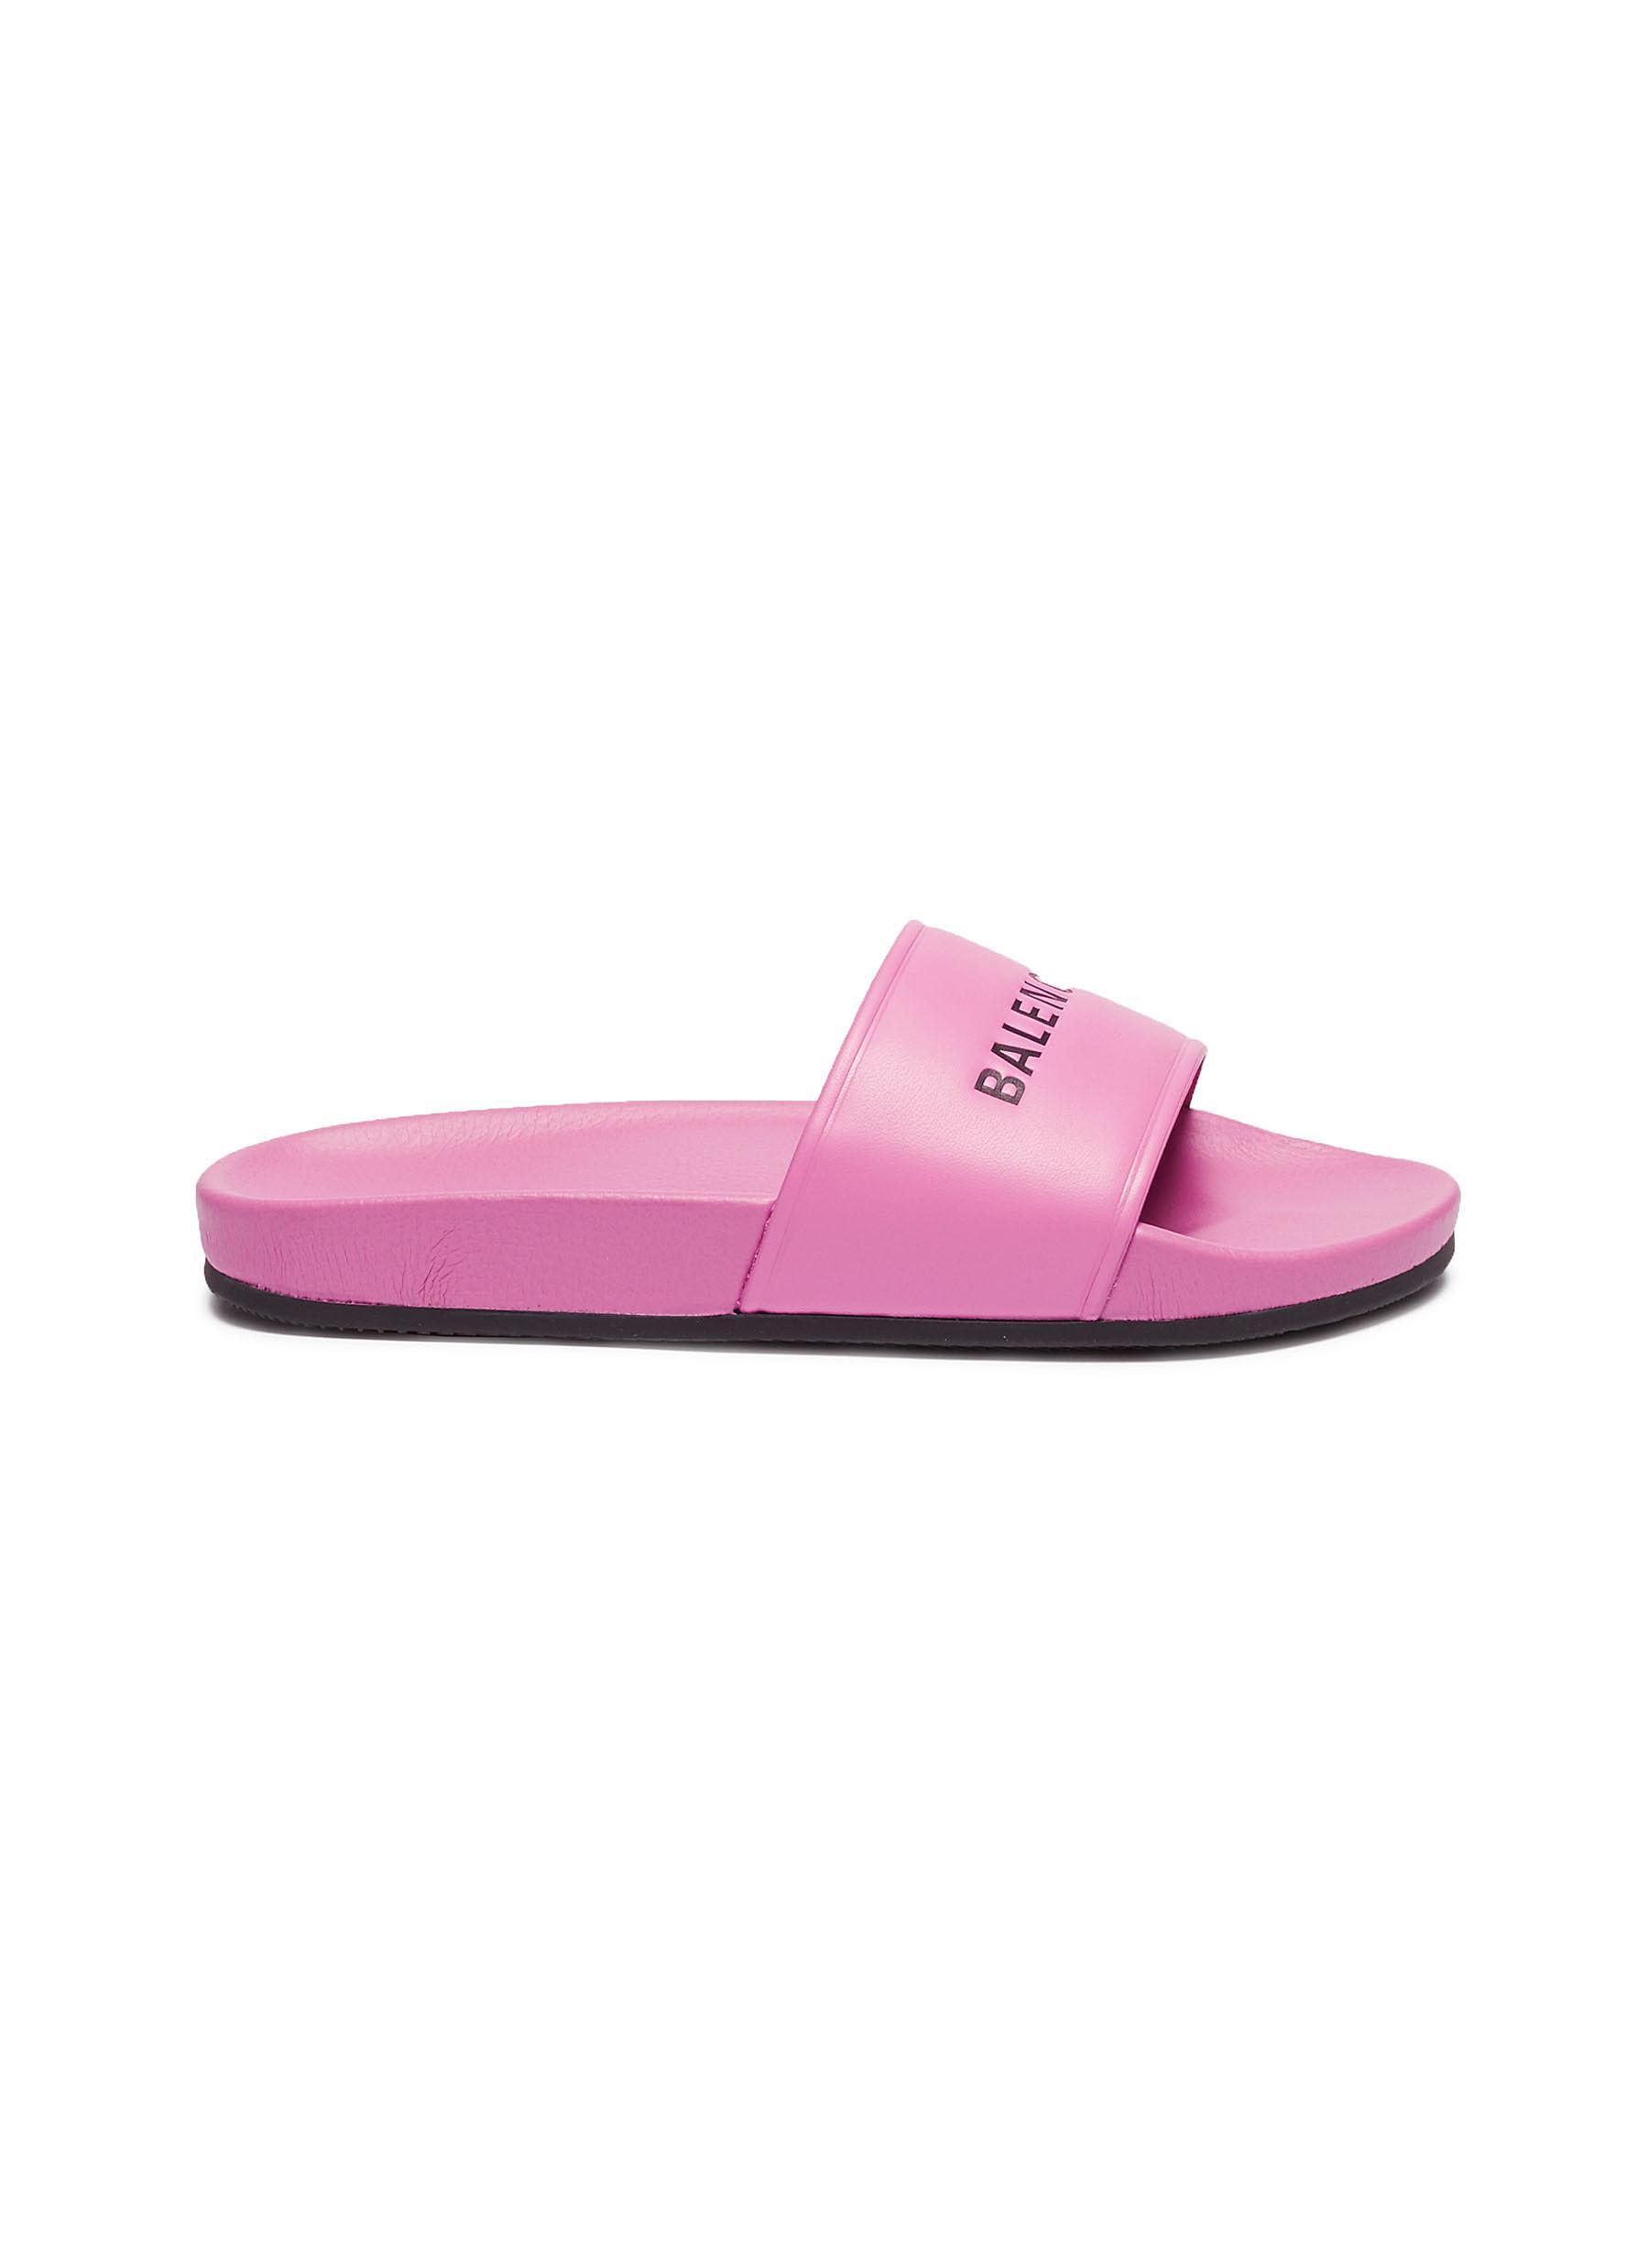 90b3c9cd6ff8 Balenciaga.  Pool  logo print leather slide sandals